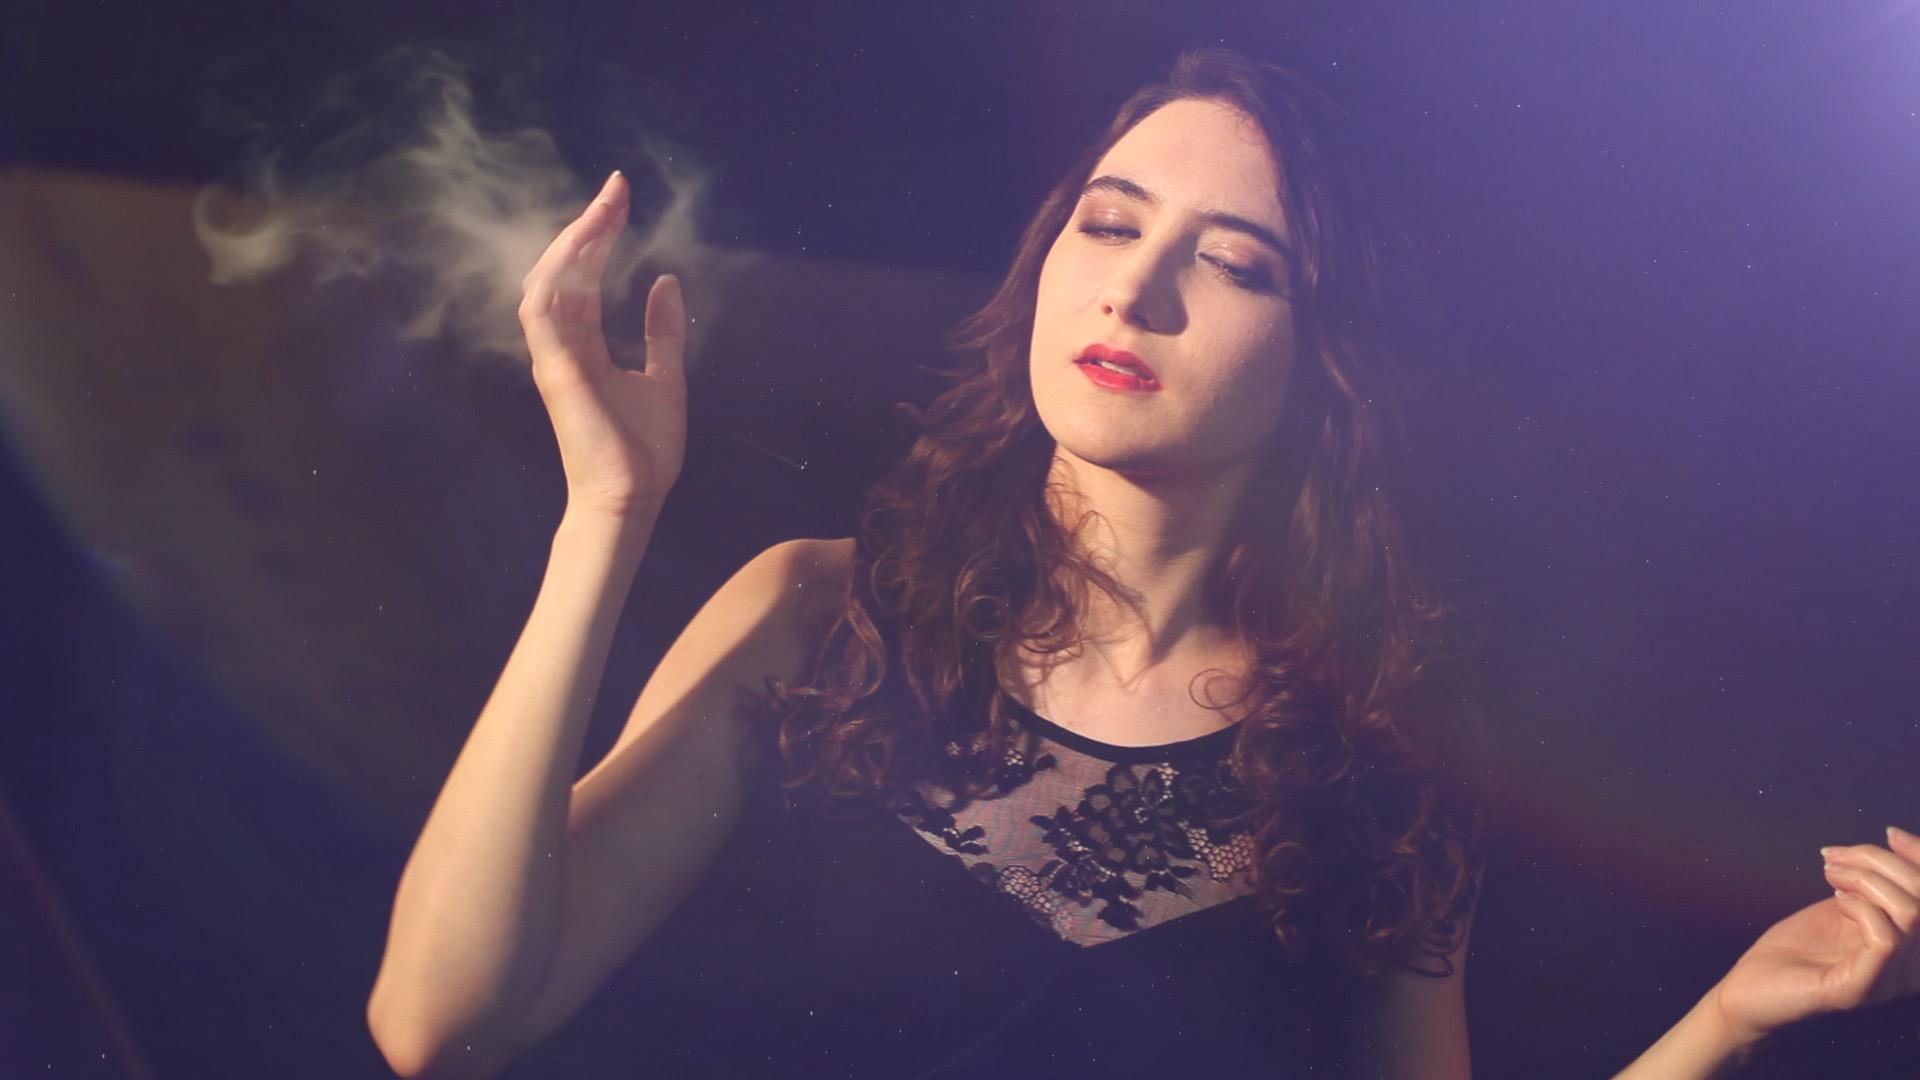 clip – Juste en rêvant – Elerose-music -viviane -riberaigua -realisateur music video director